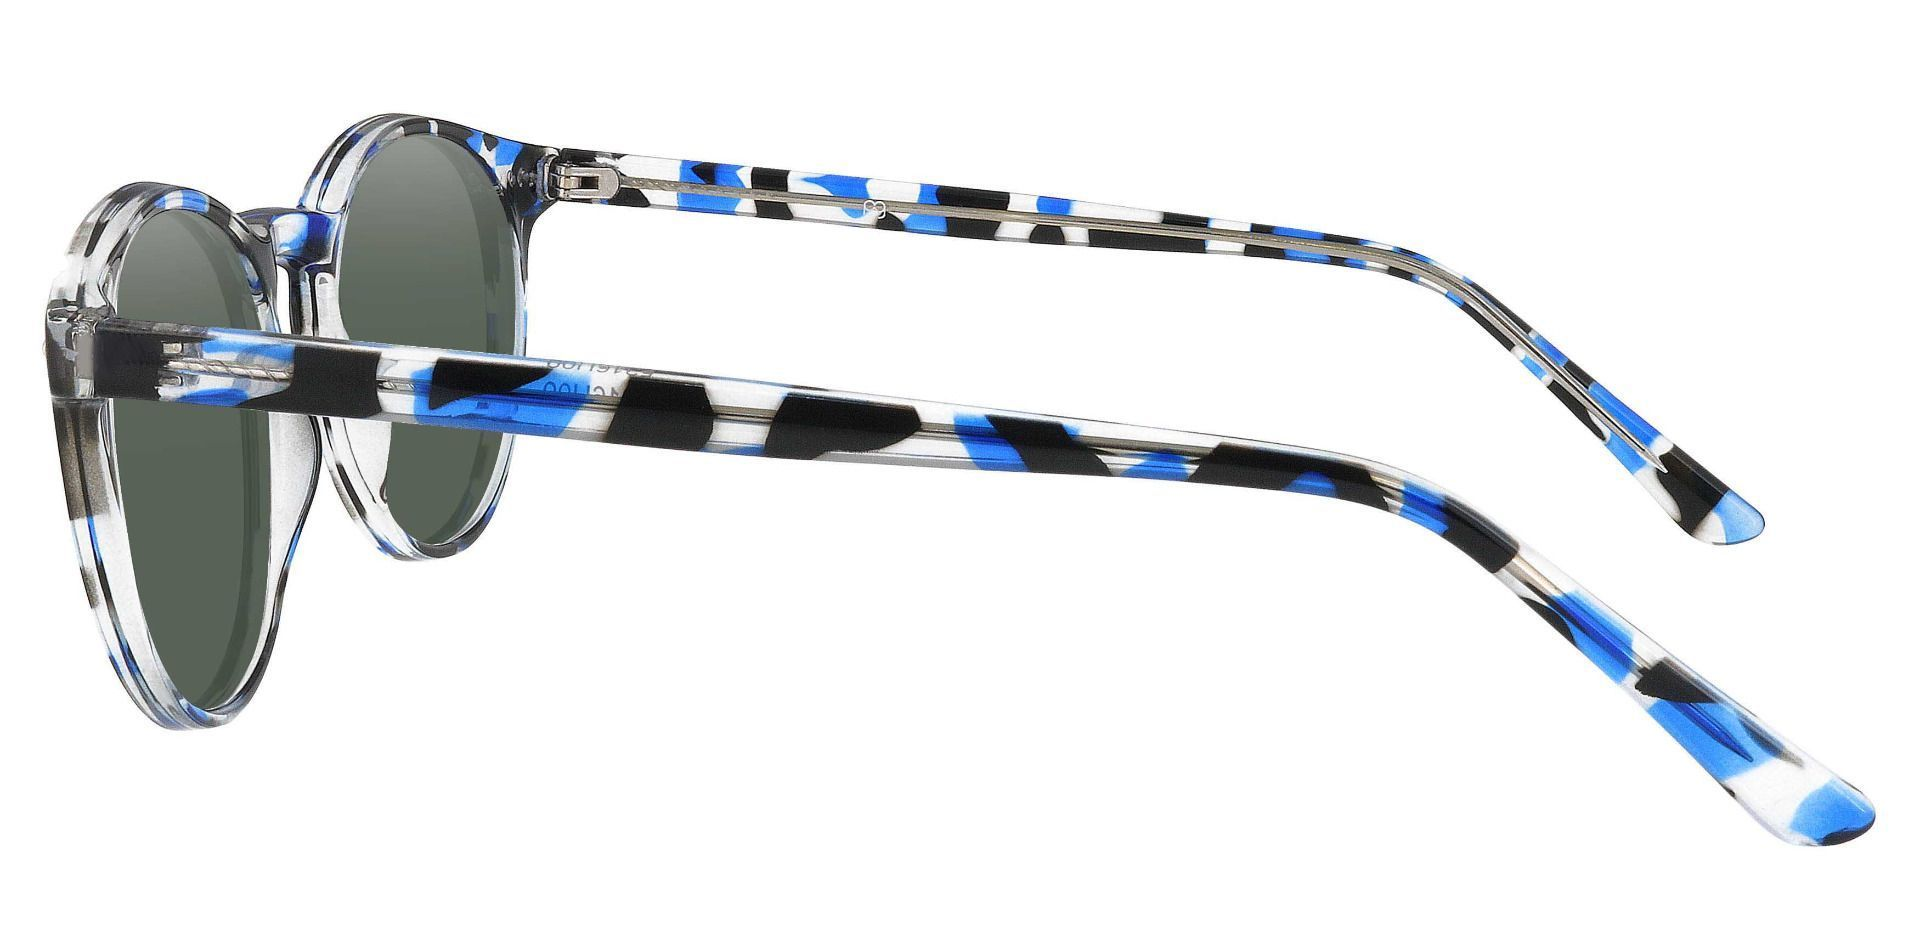 Dormont Round Prescription Sunglasses - Blue Frame With Green Lenses